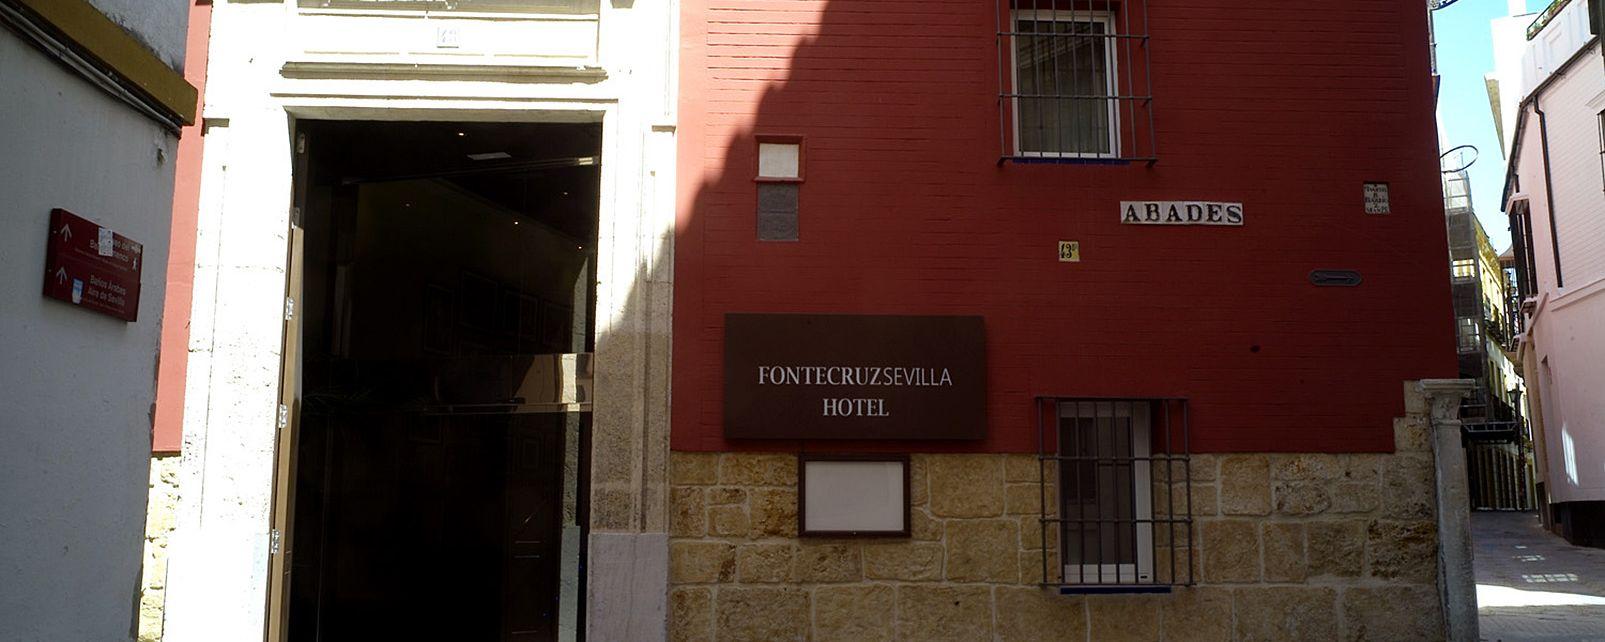 Hotel Fontecruz